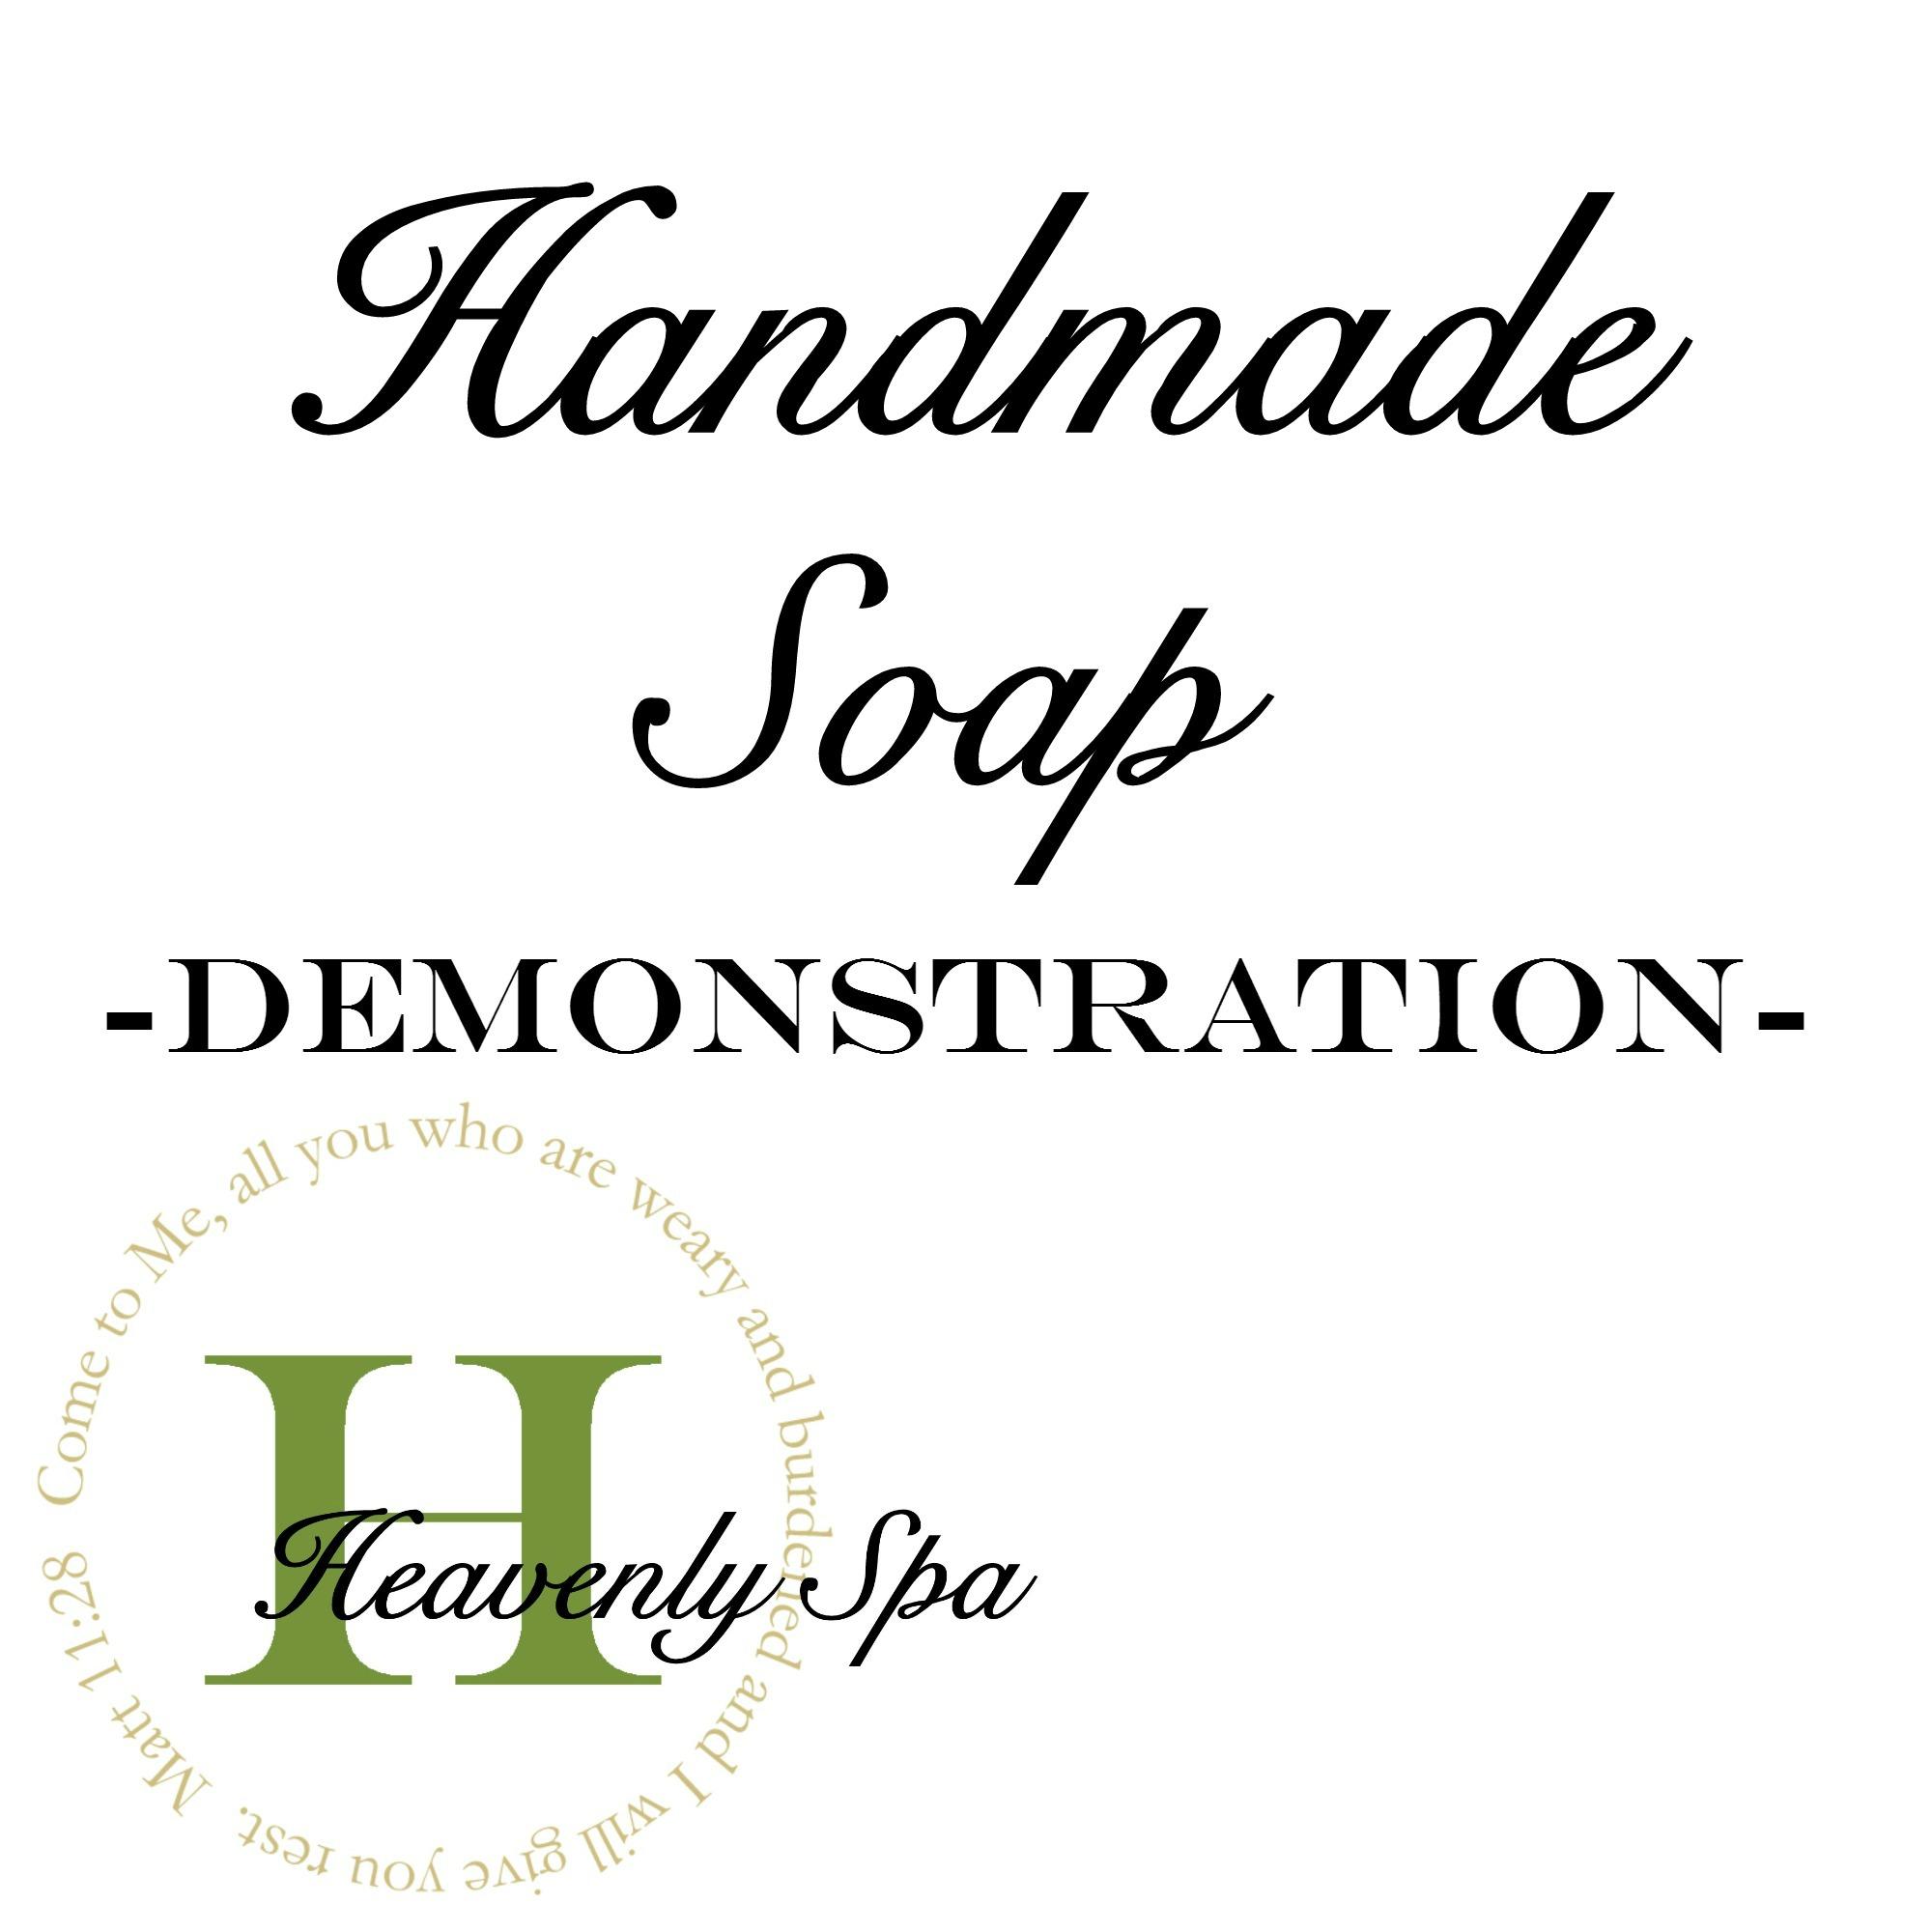 Handmade Soap -Demo-